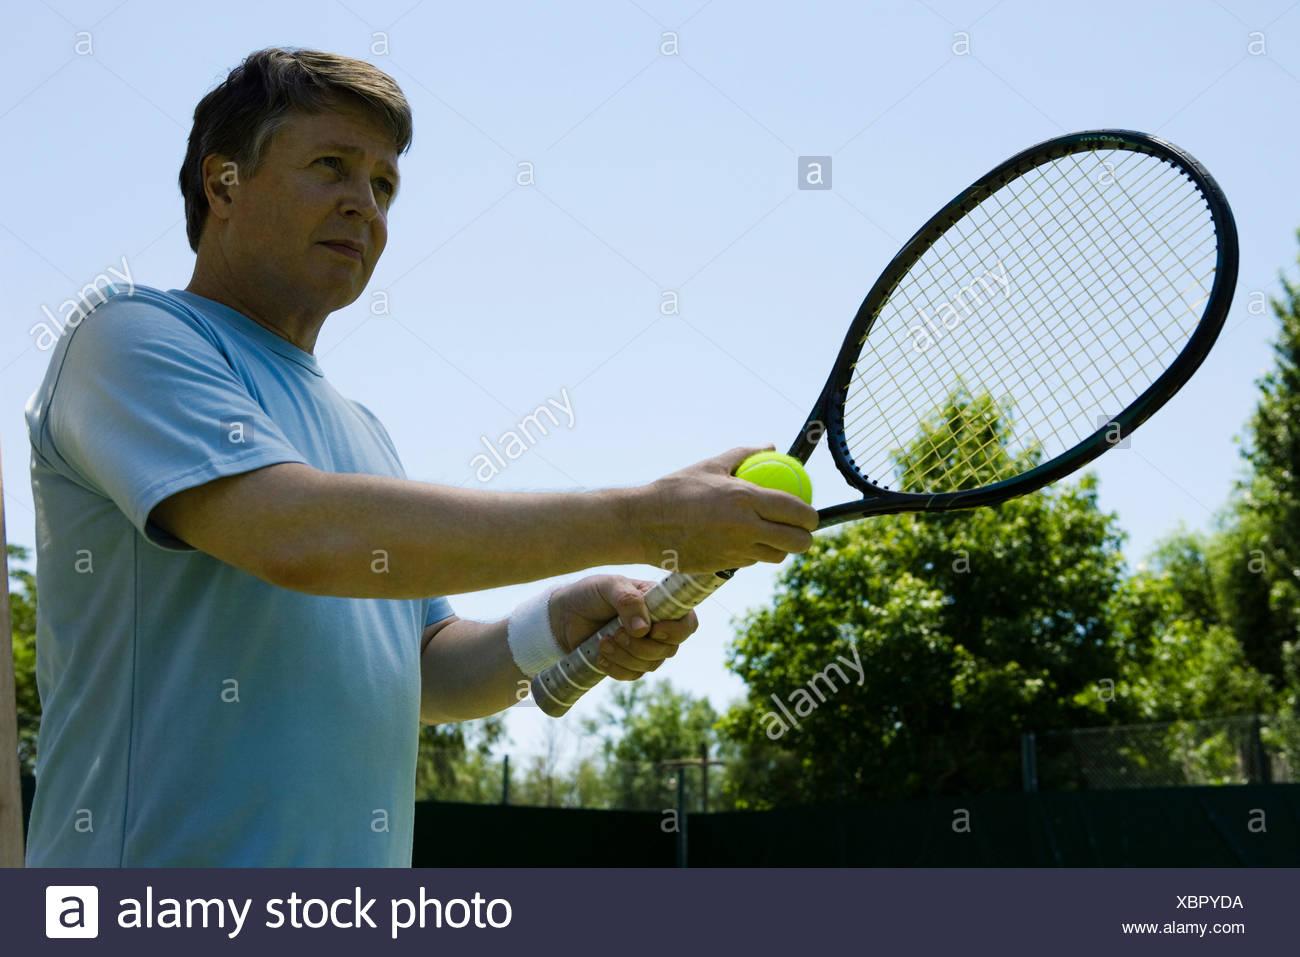 Tennis player preparing to serve - Stock Image